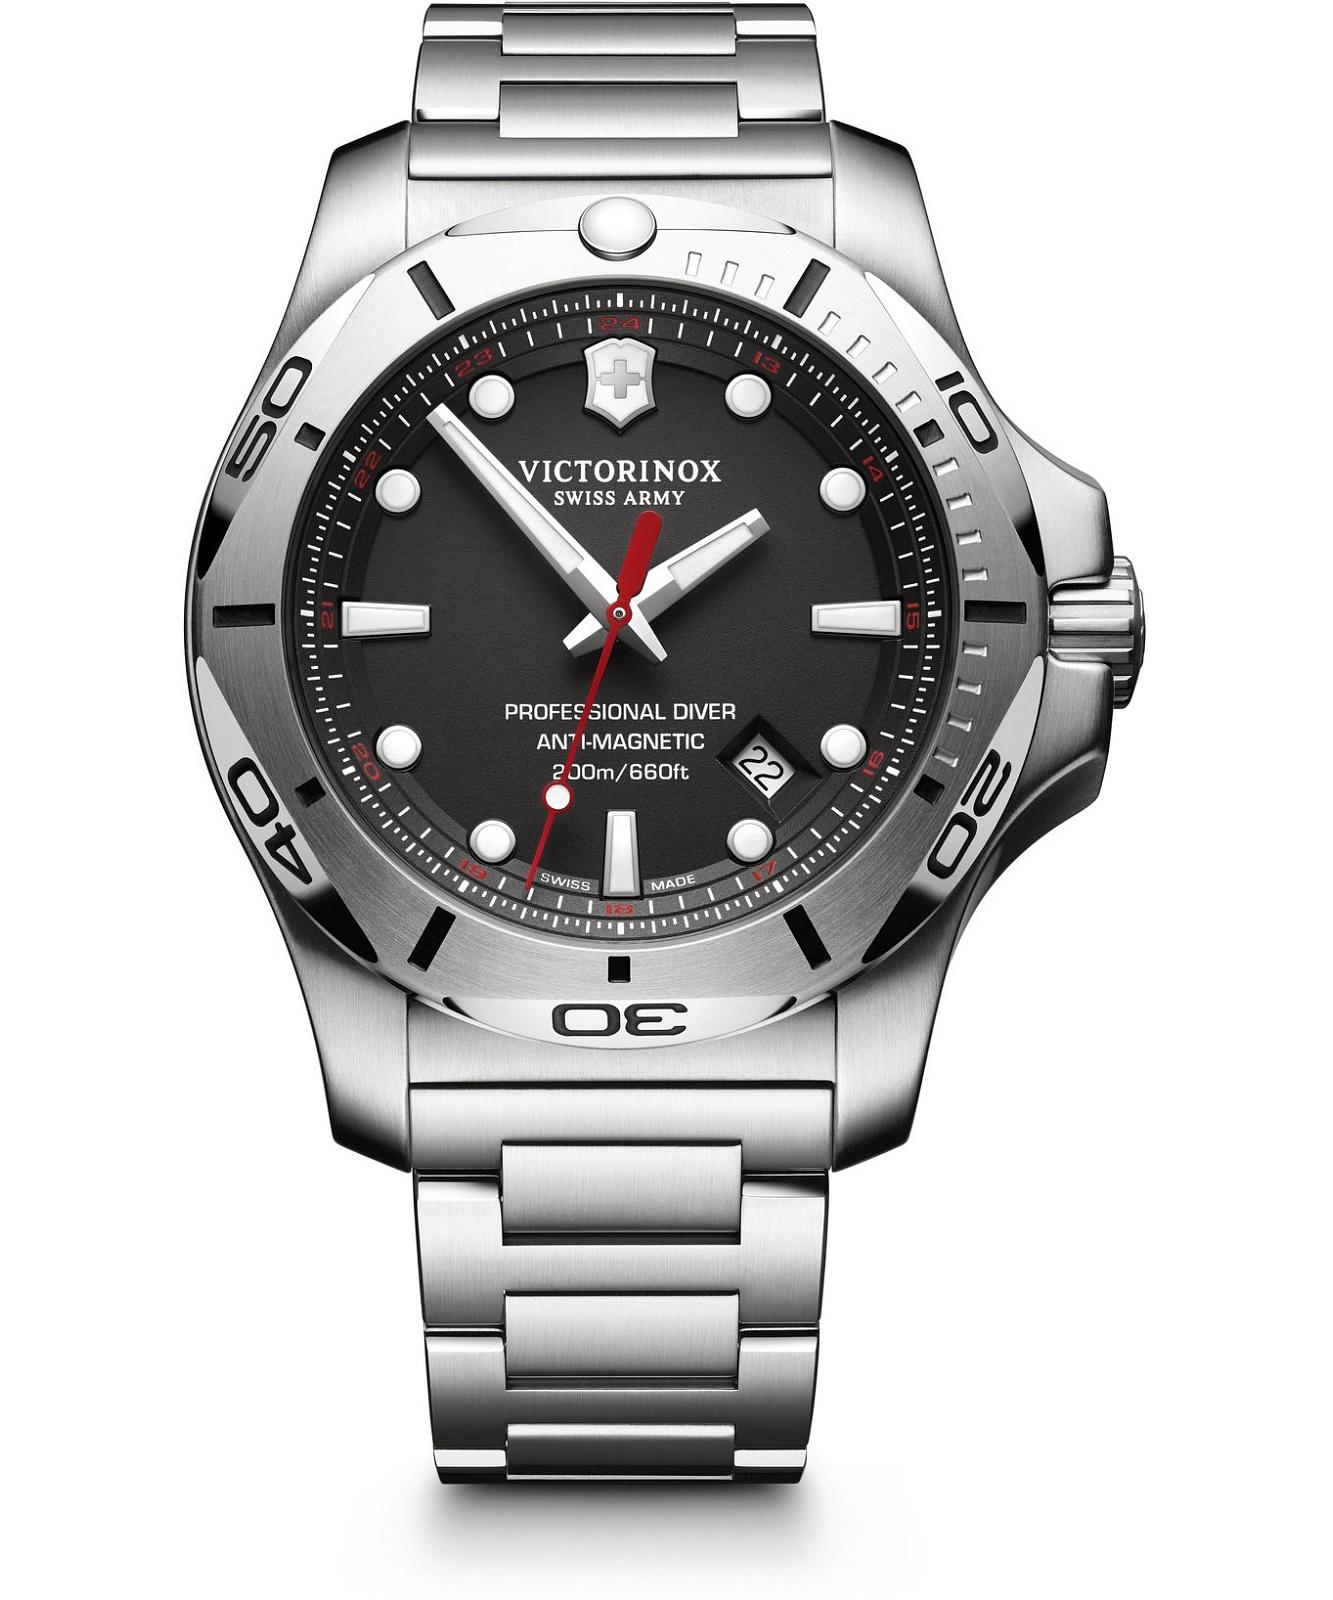 zegarek-meski-victorinox-i-n-o-x-professional-diver-241781